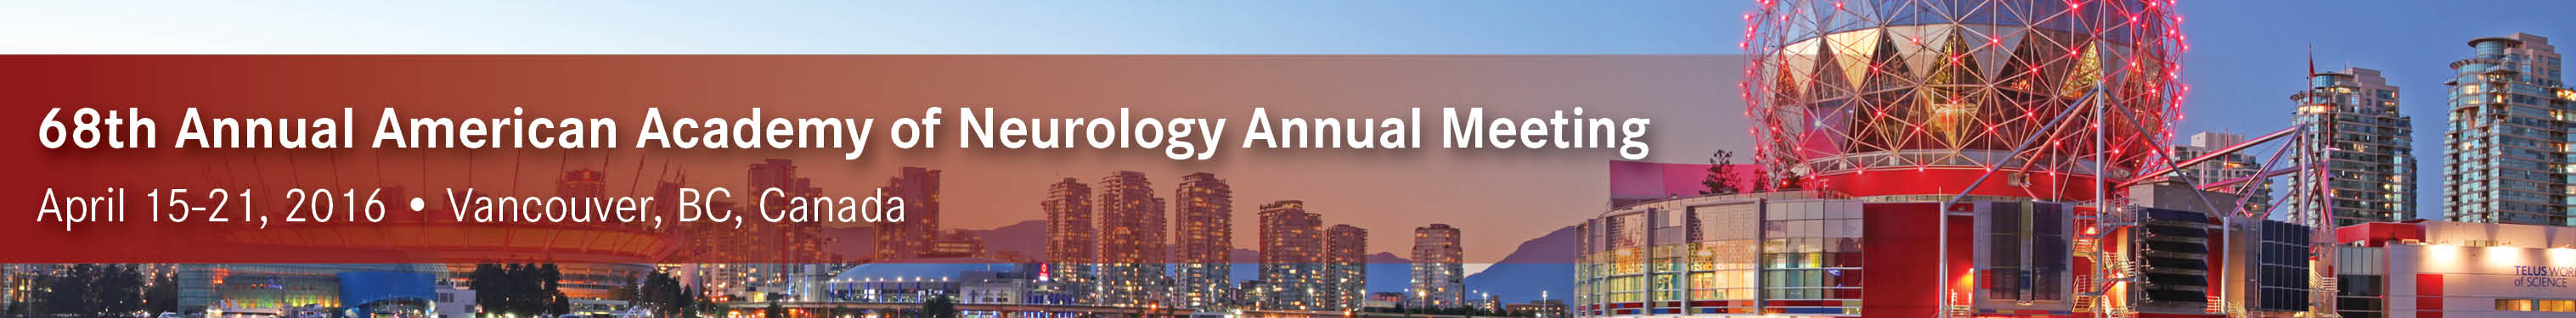 68th American Academy of Neurology Annual Meeting